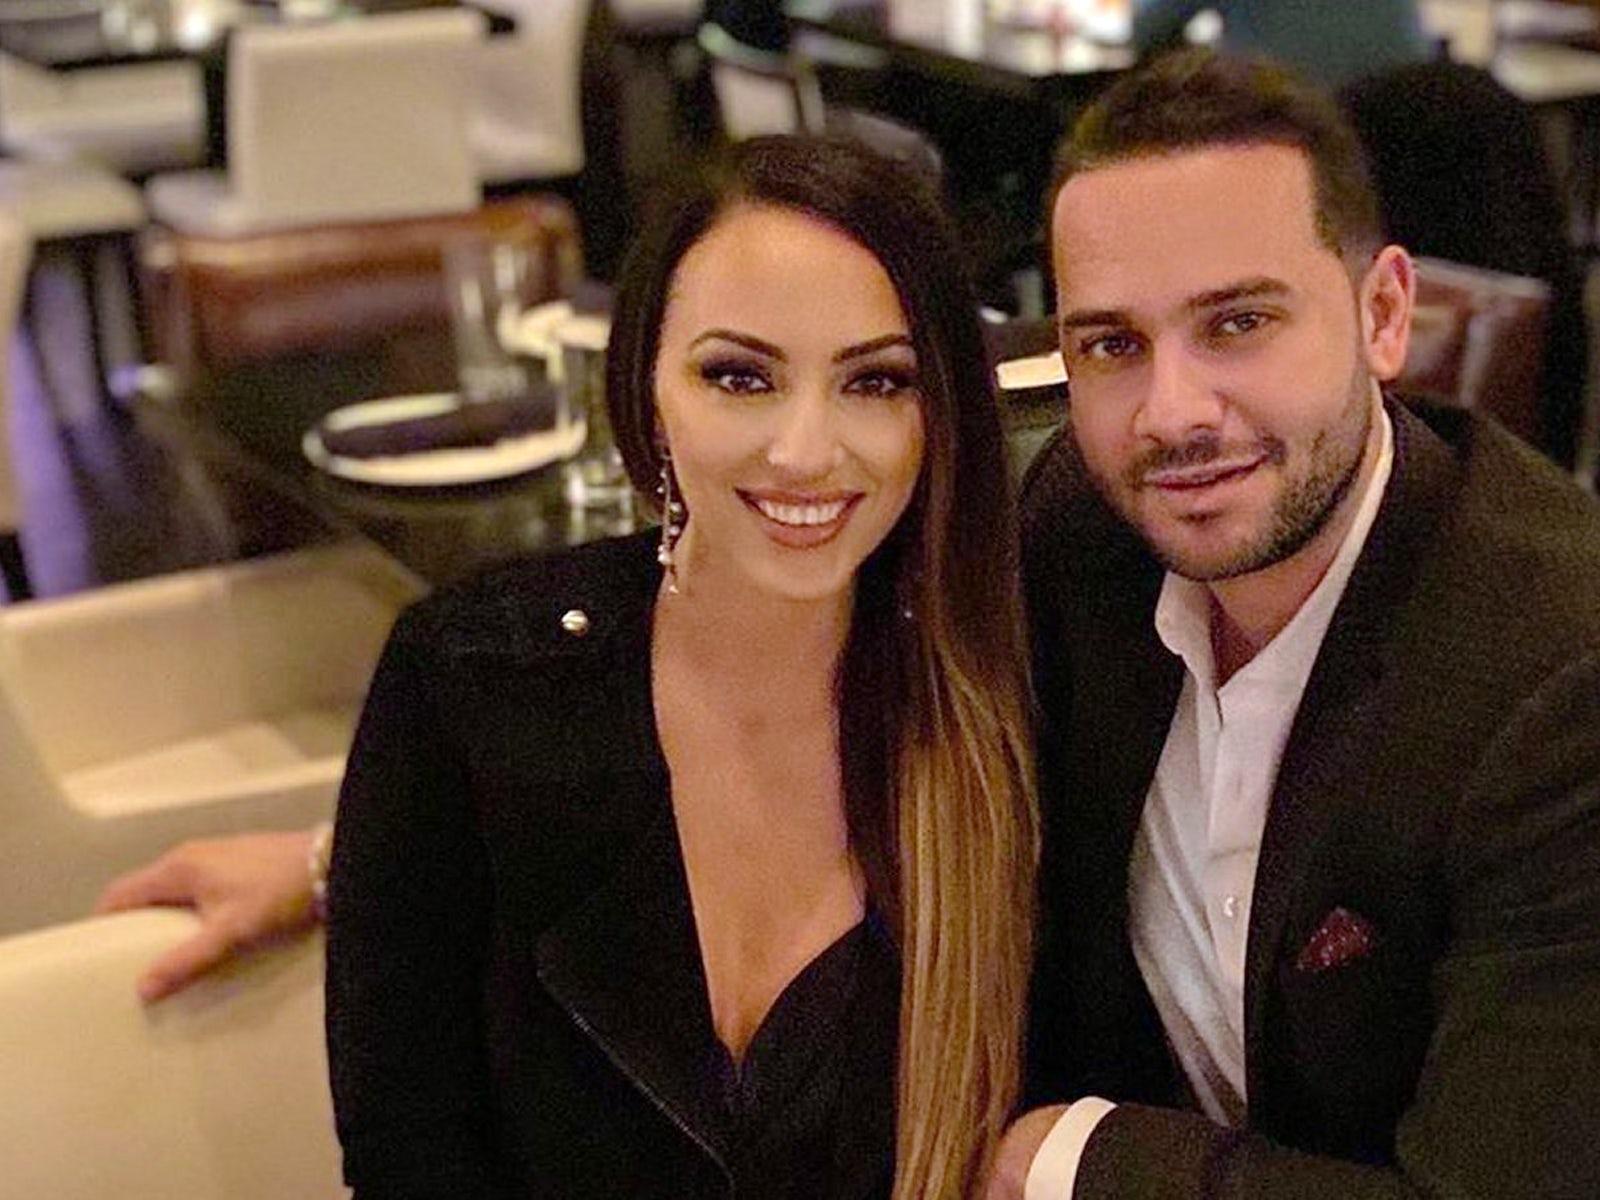 Tomas Noseks Girlfriend Eliska Chocholousova (Bio, Wiki)